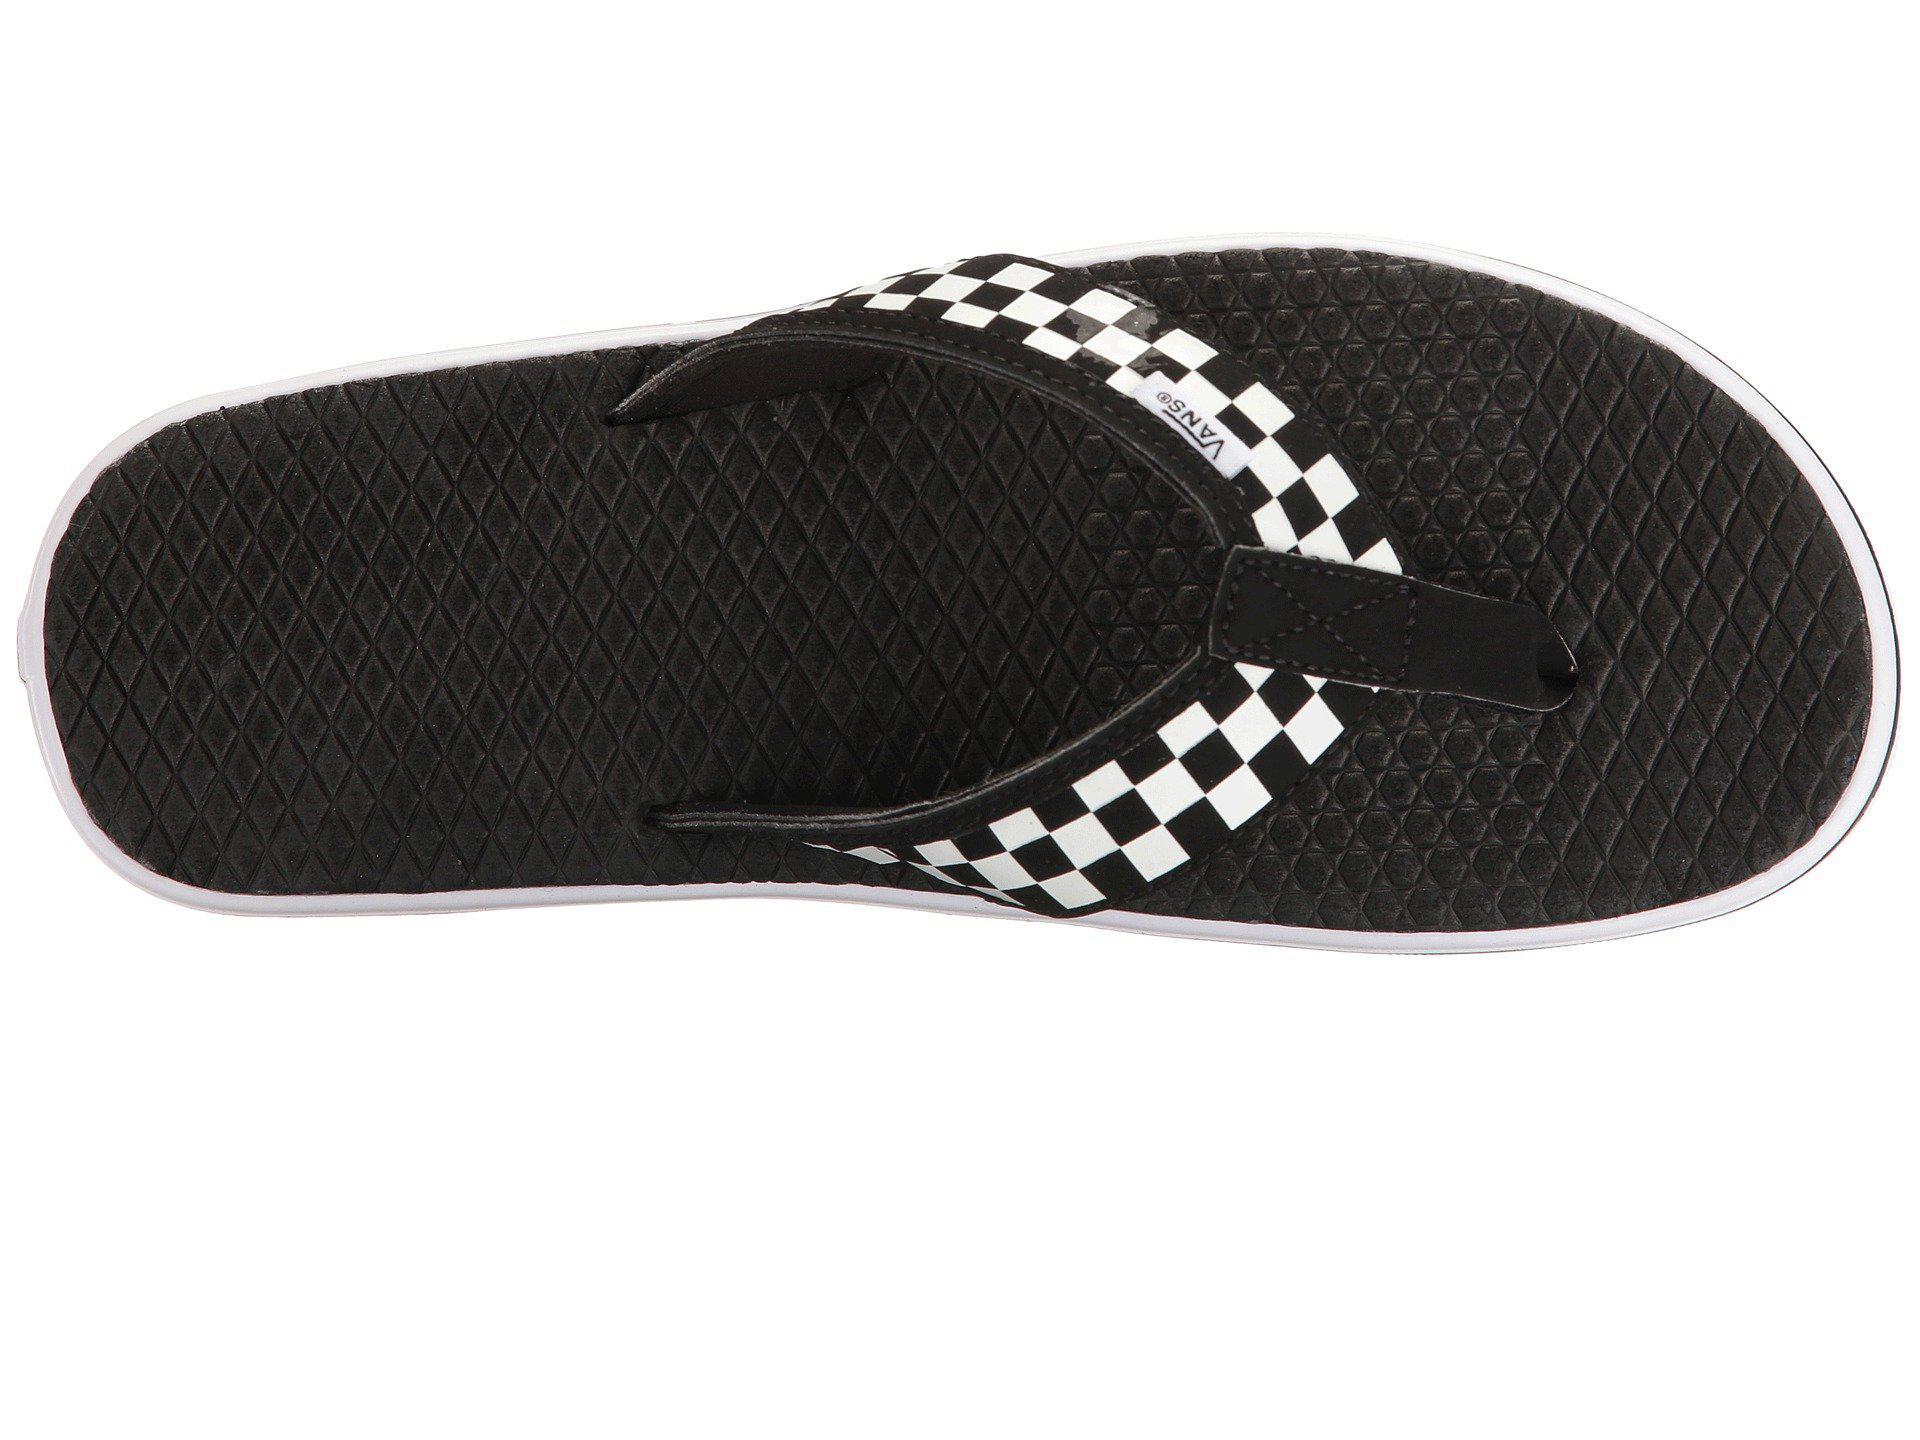 97080c0736 Vans - La Costa Lite ((checkerboard) Black white) Men s Sandals for. View  fullscreen